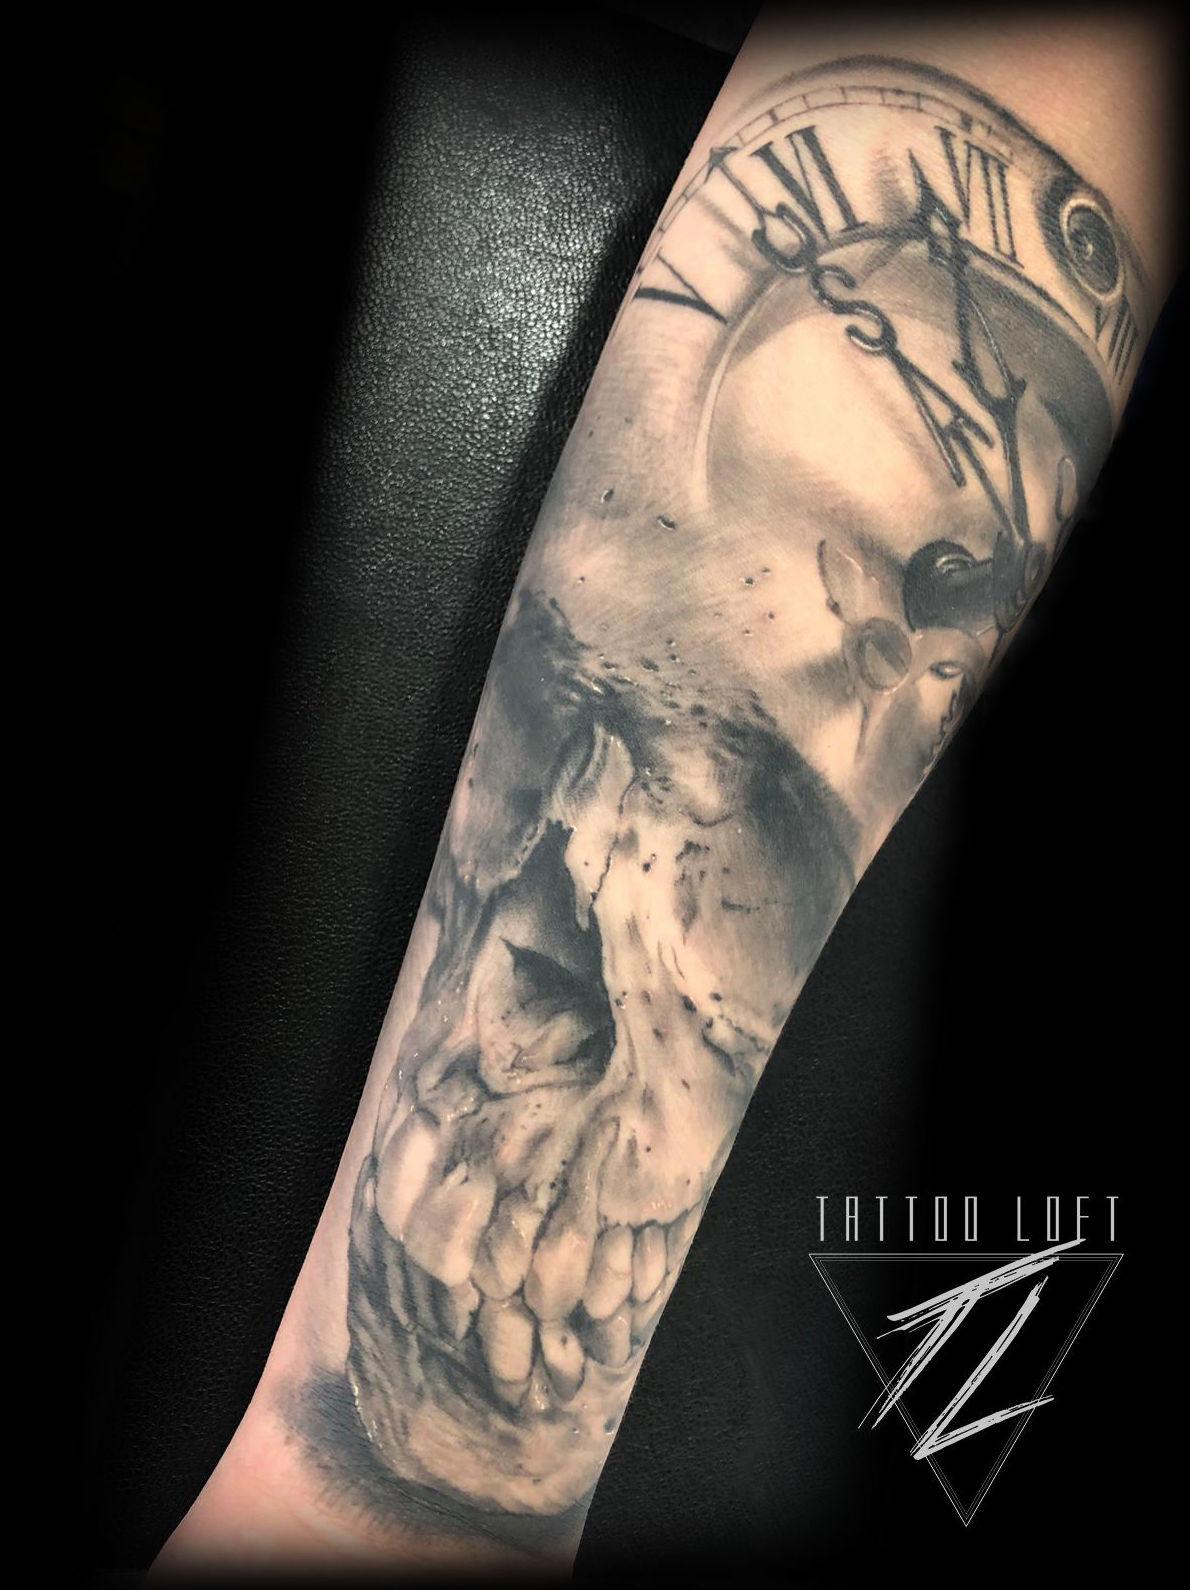 Foto 47 de Estudio artístico de tatuaje en  | Tattoo Loft